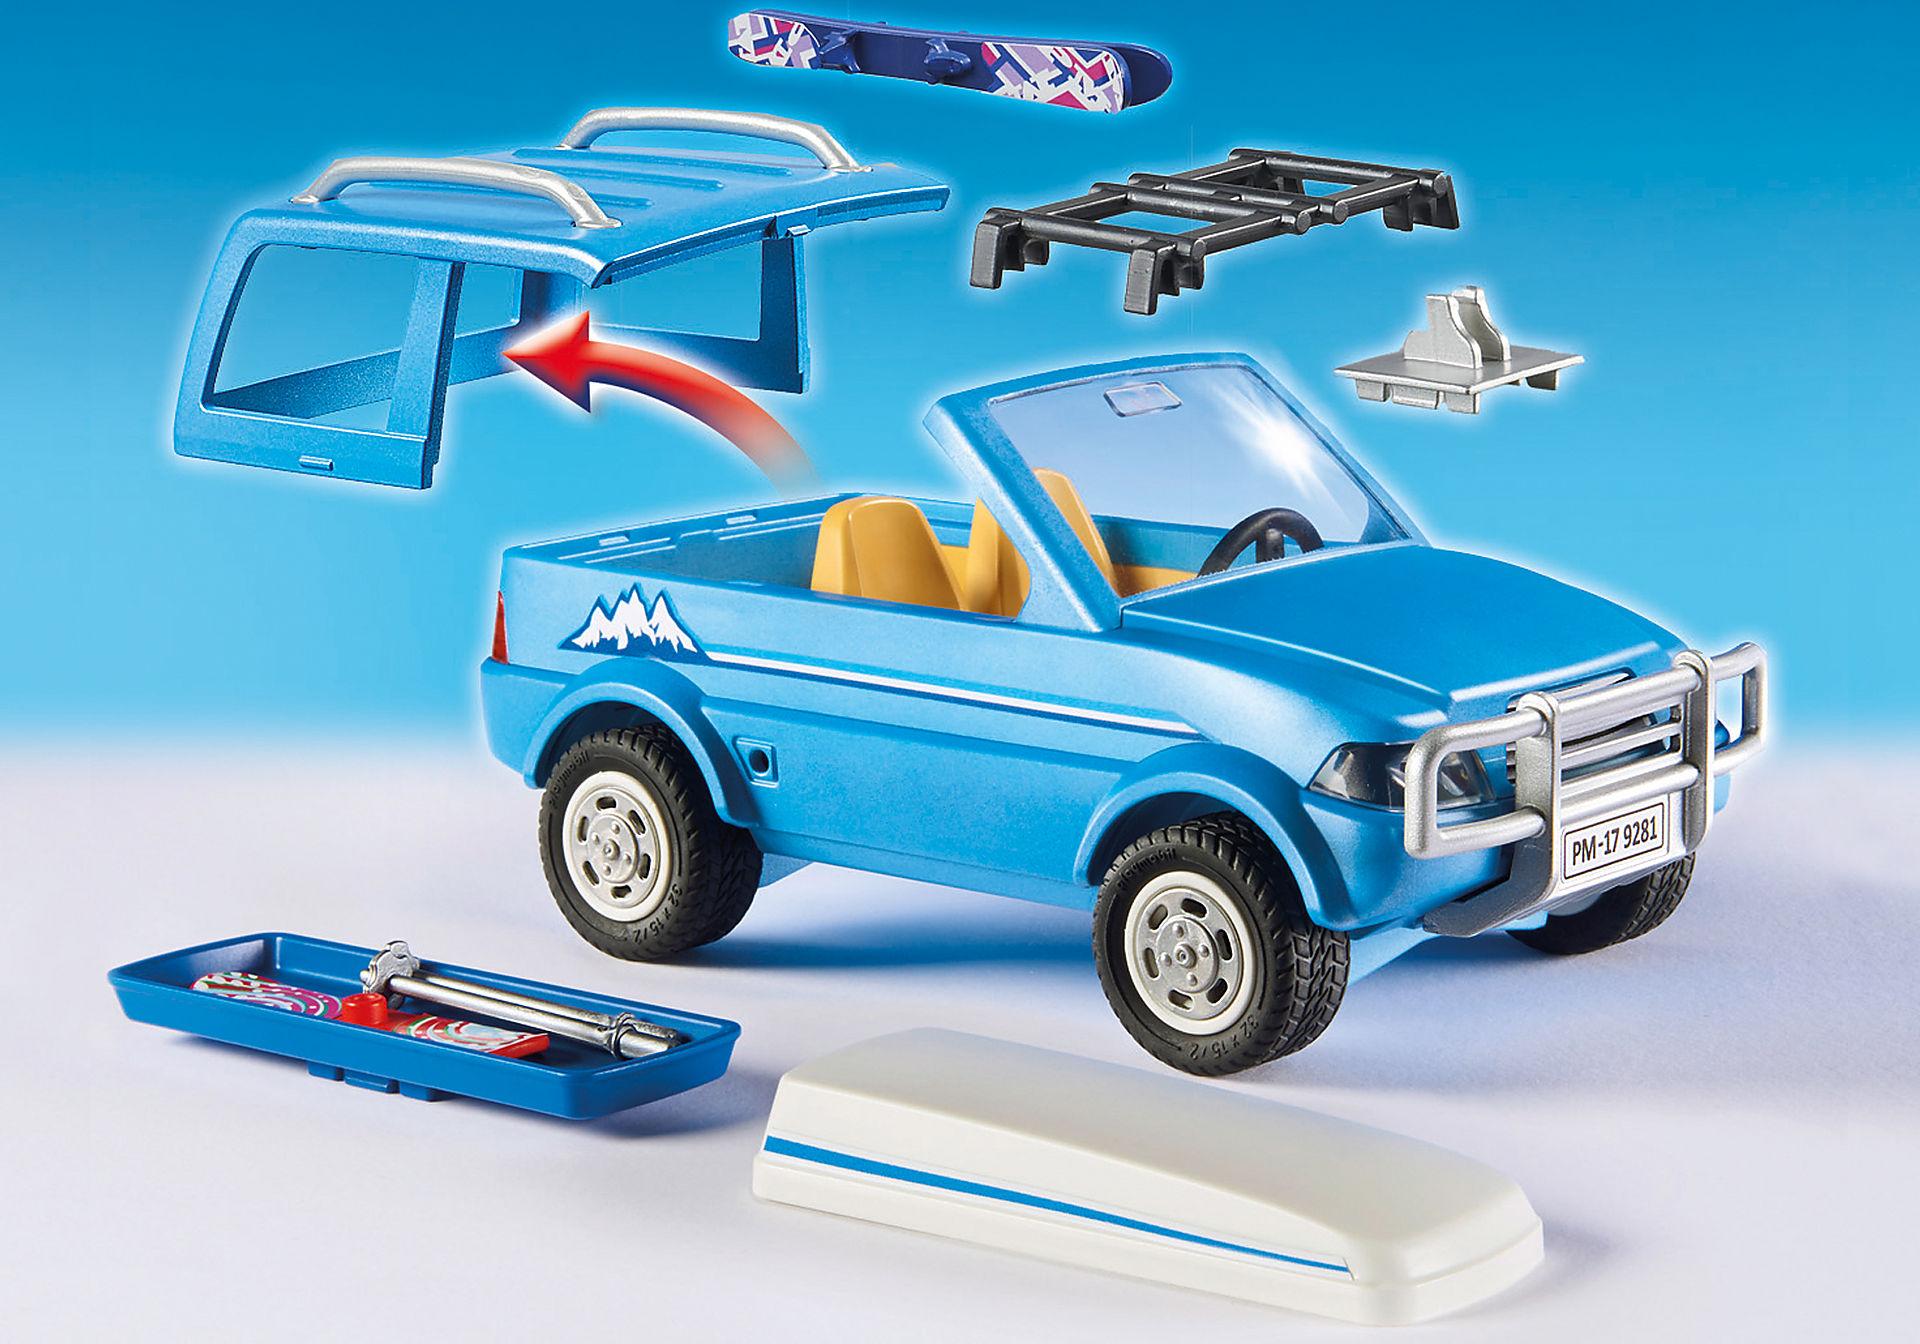 http://media.playmobil.com/i/playmobil/9281_product_extra3/4x4 avec coffre de toit